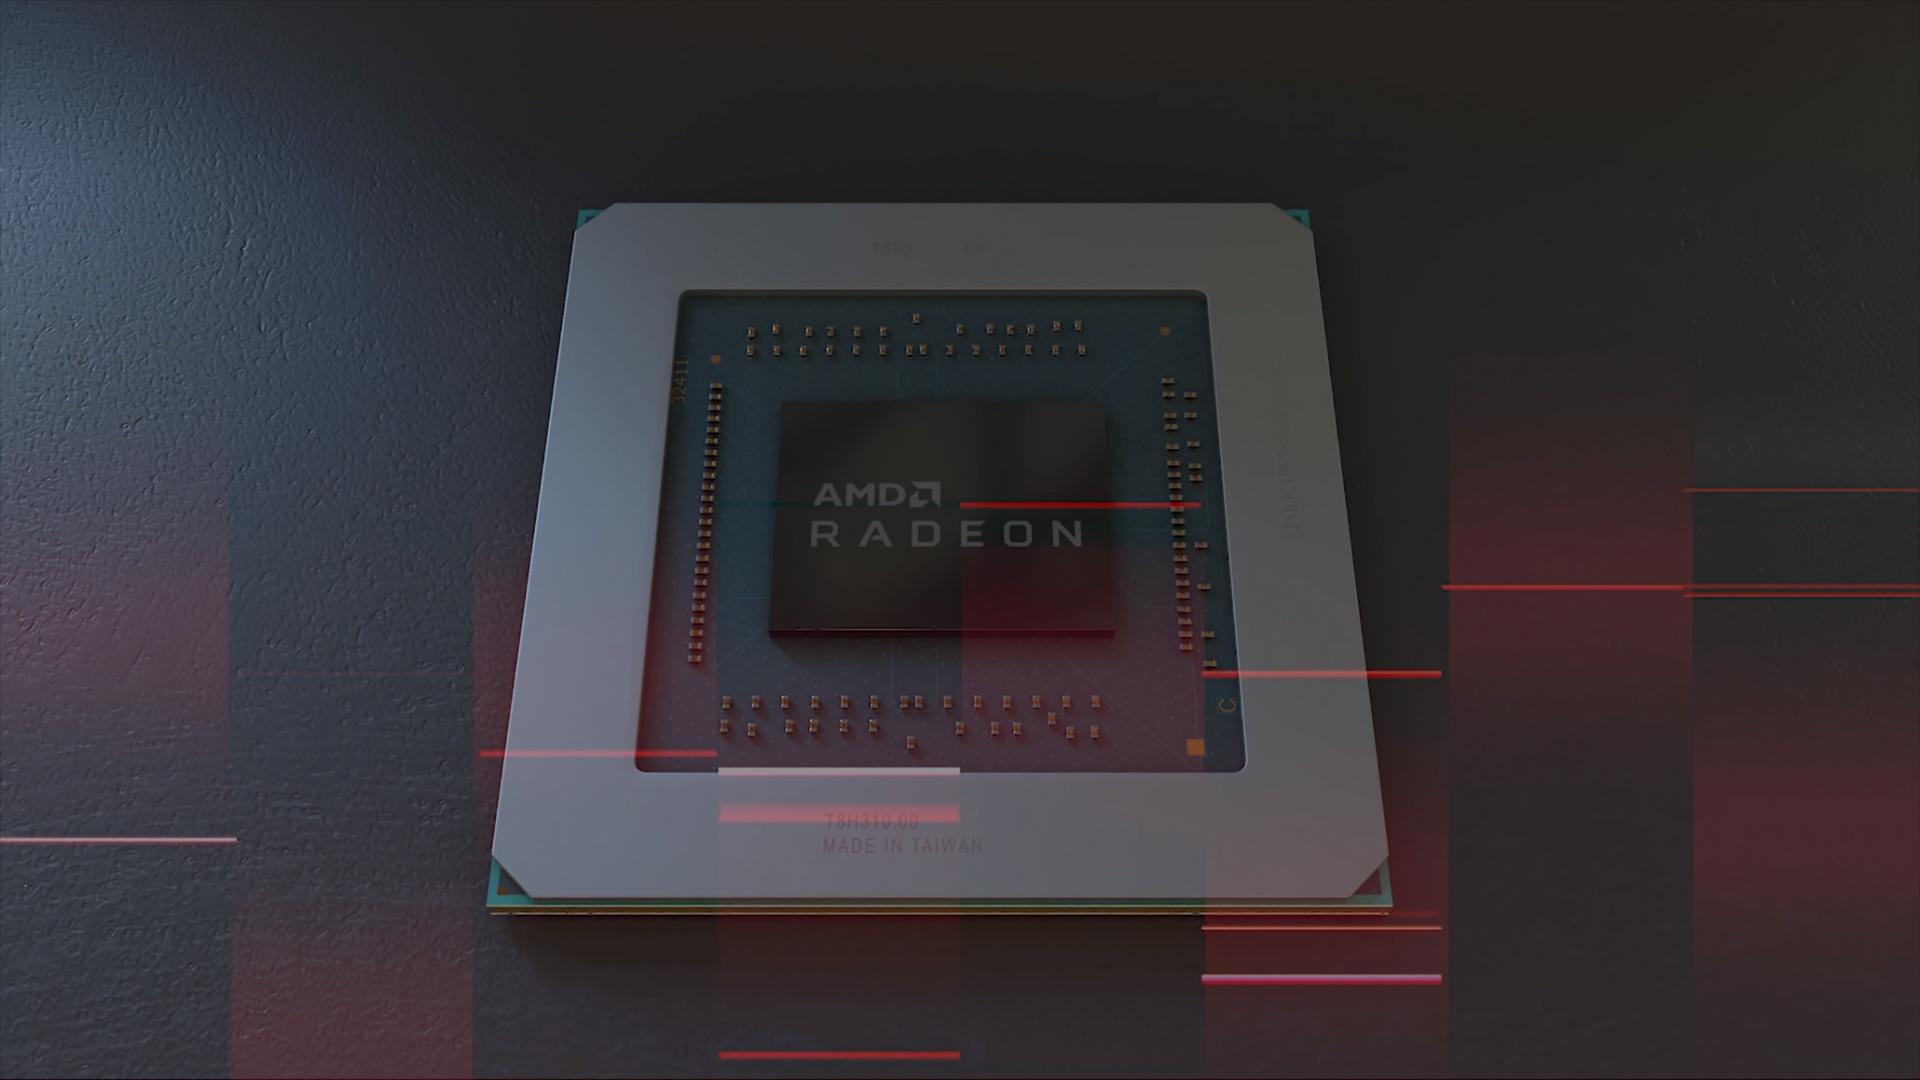 Слухи: AMD готовит видеокарты серии Radeon RX 5800 на Navi12 и RX 5600 на Navi14